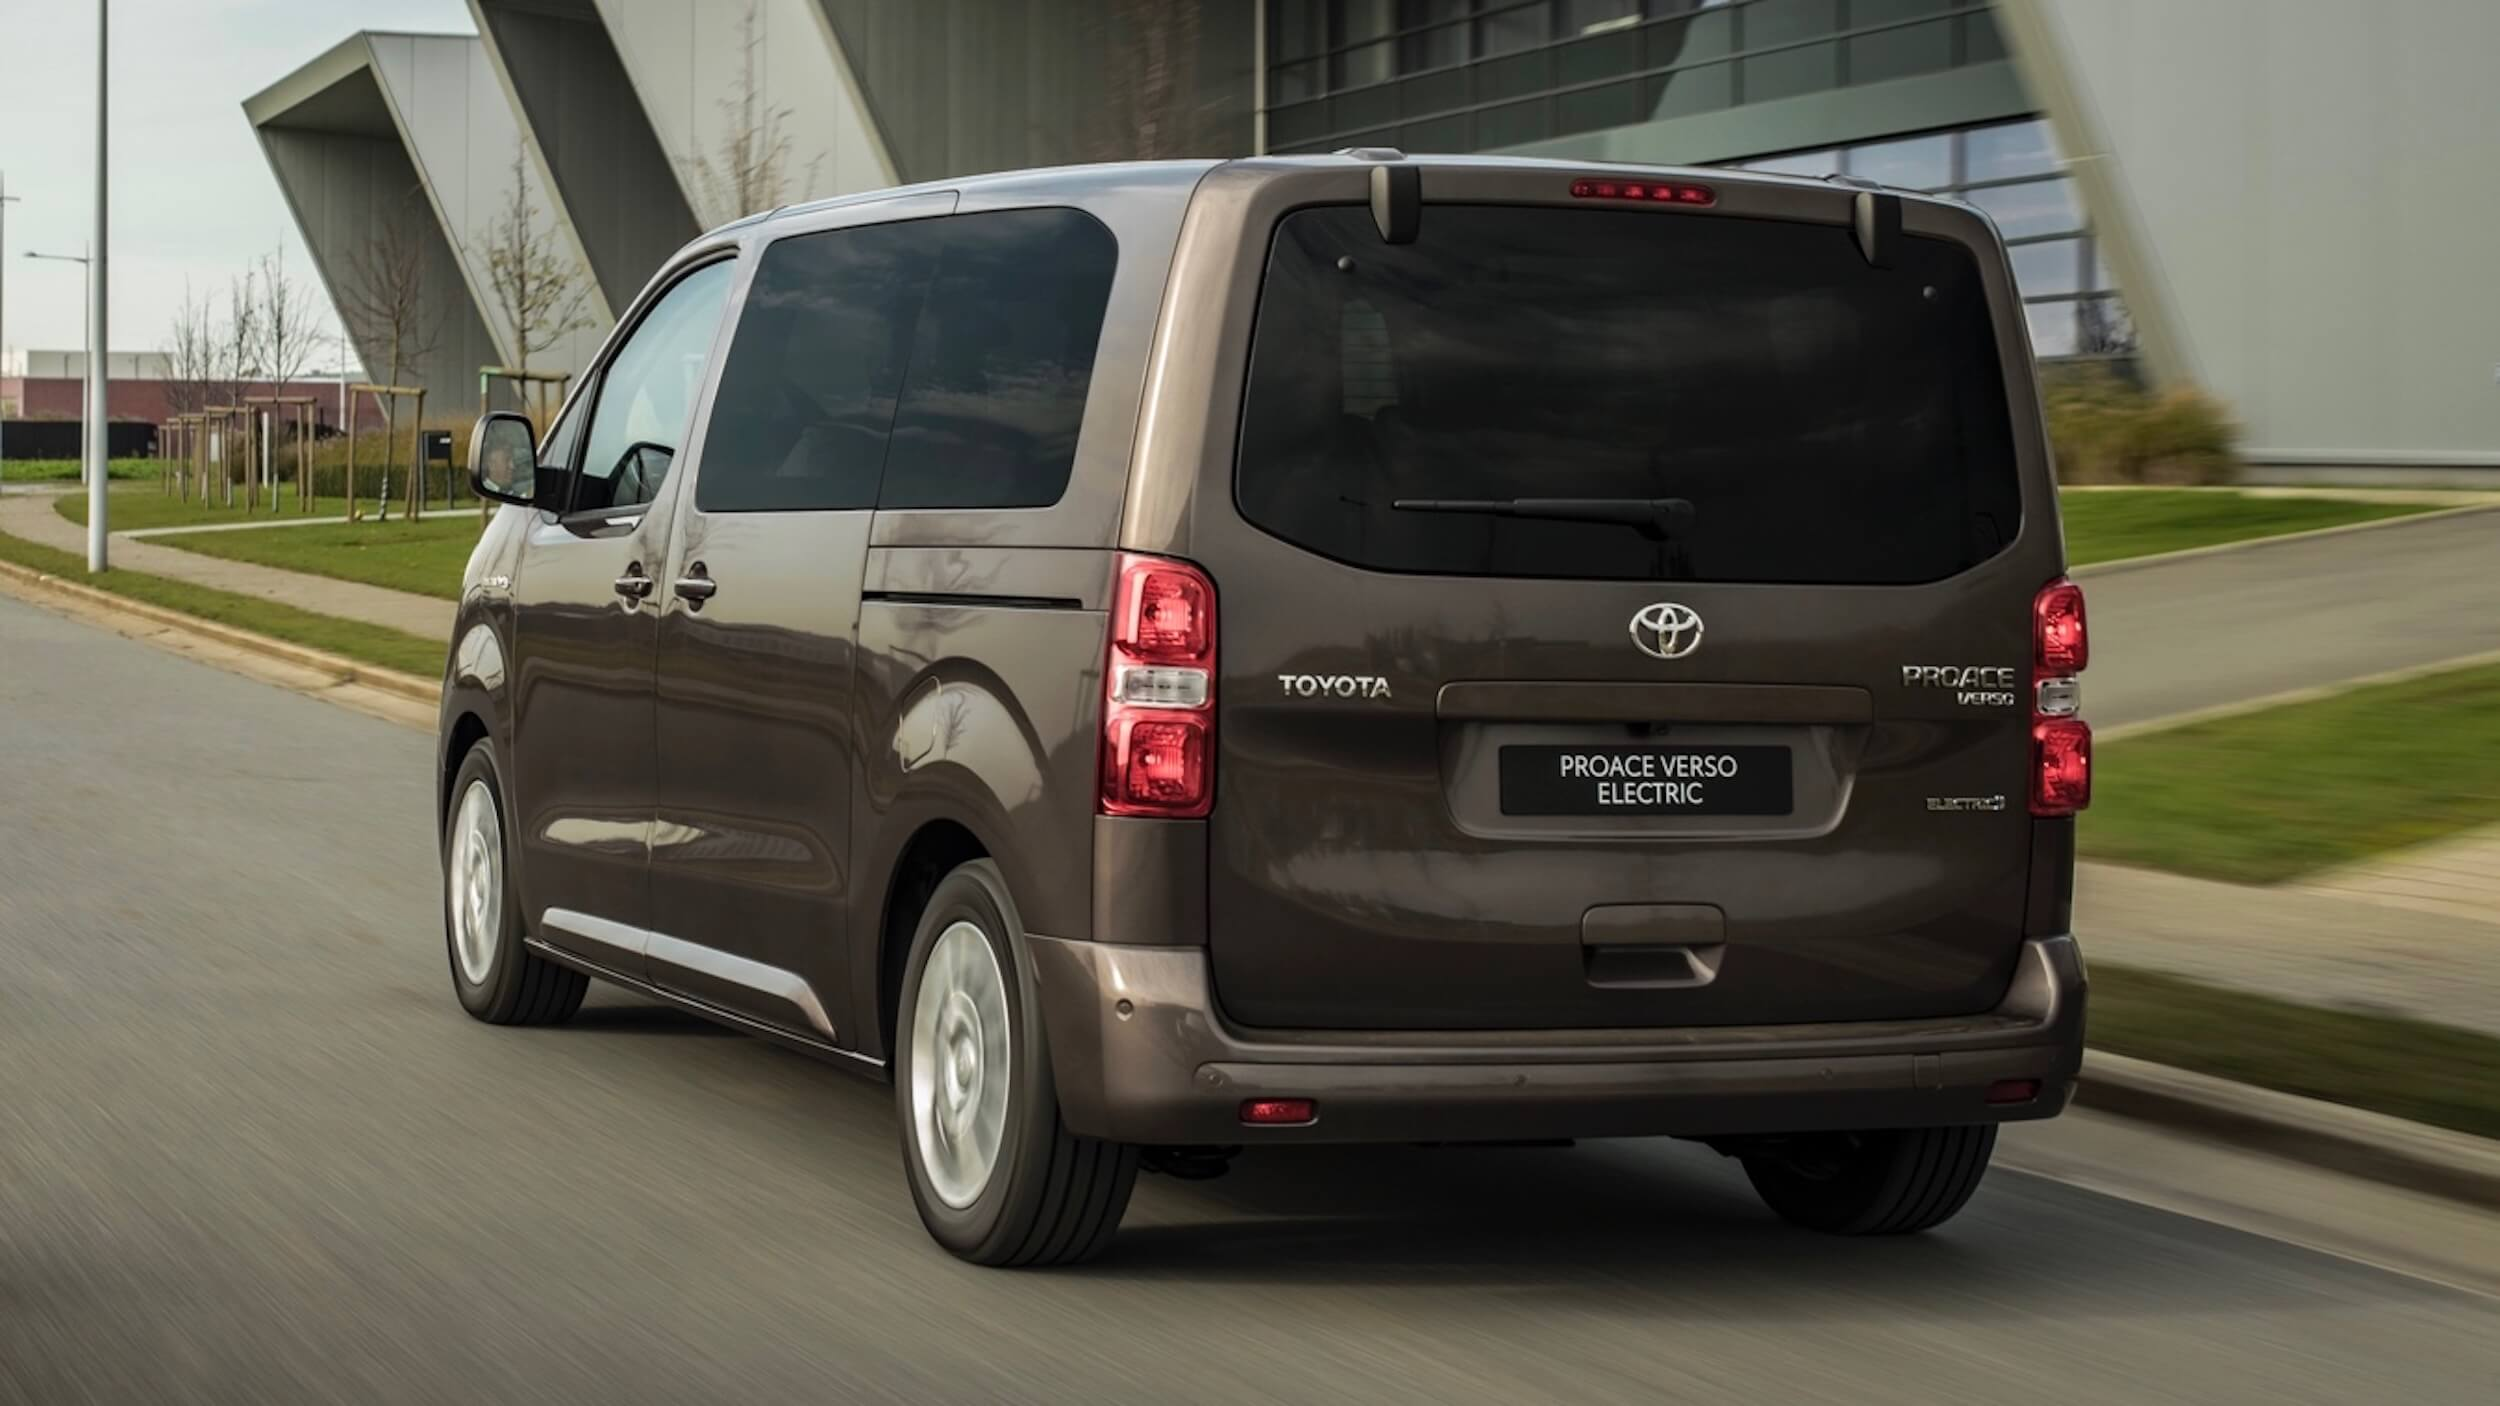 Toyota Proace Verso Electric minibus